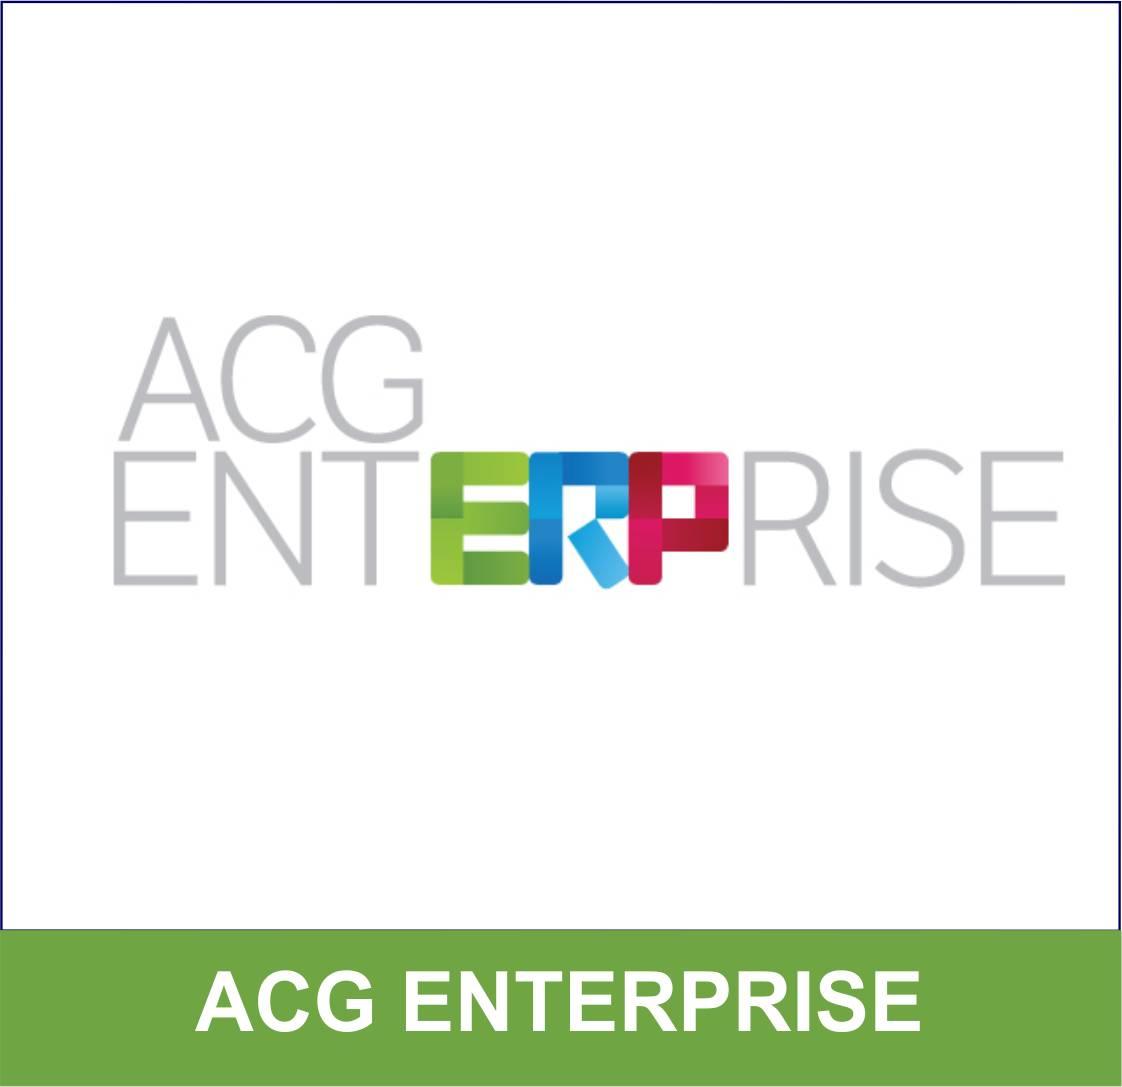 acg_ent